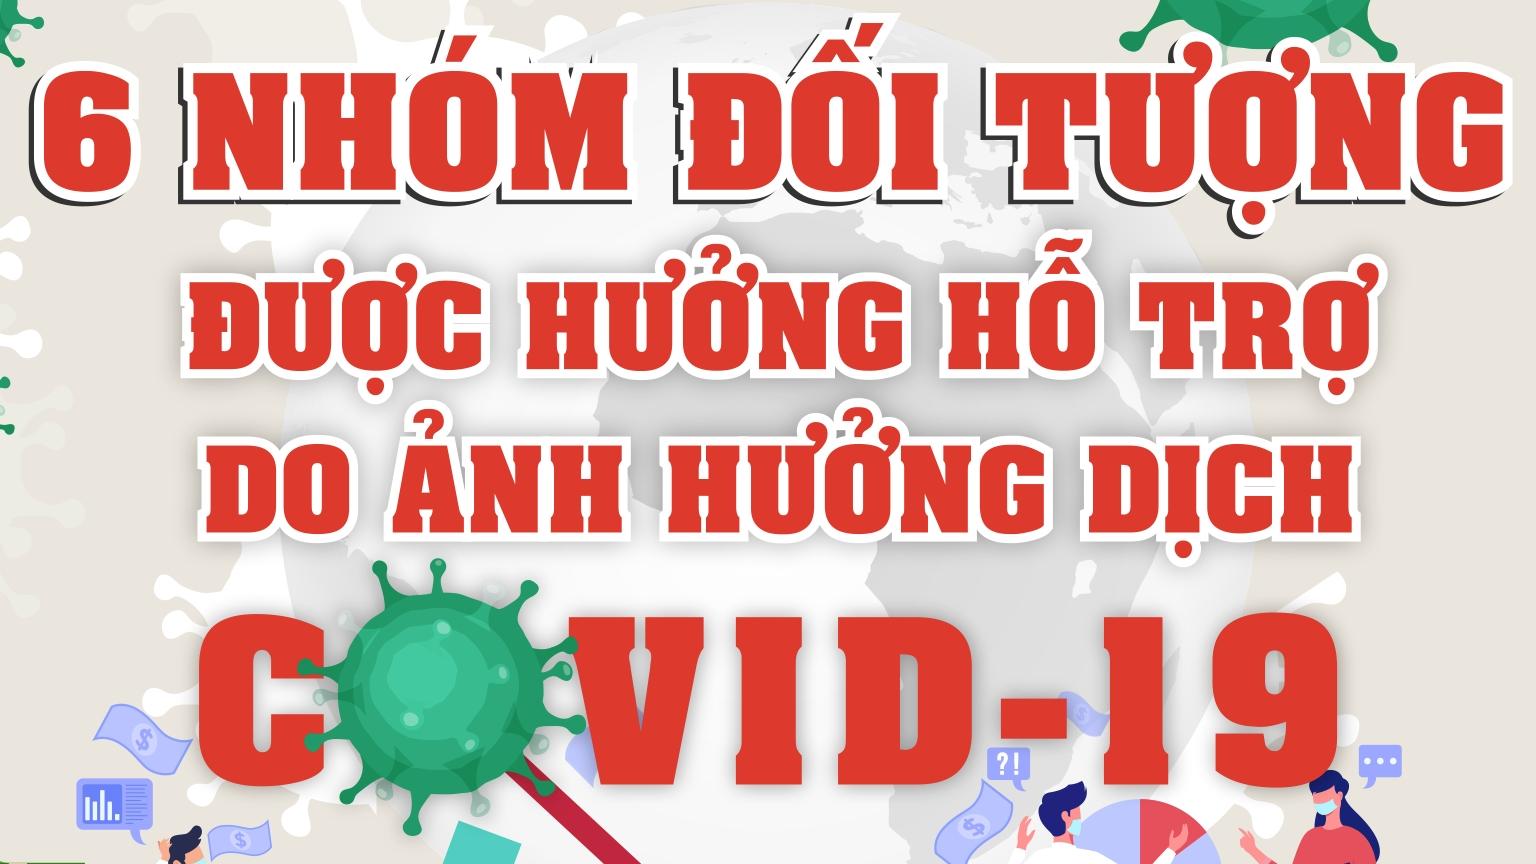 6 nhom doi tuong nao duoc huong goi ho tro vi dich covid 19